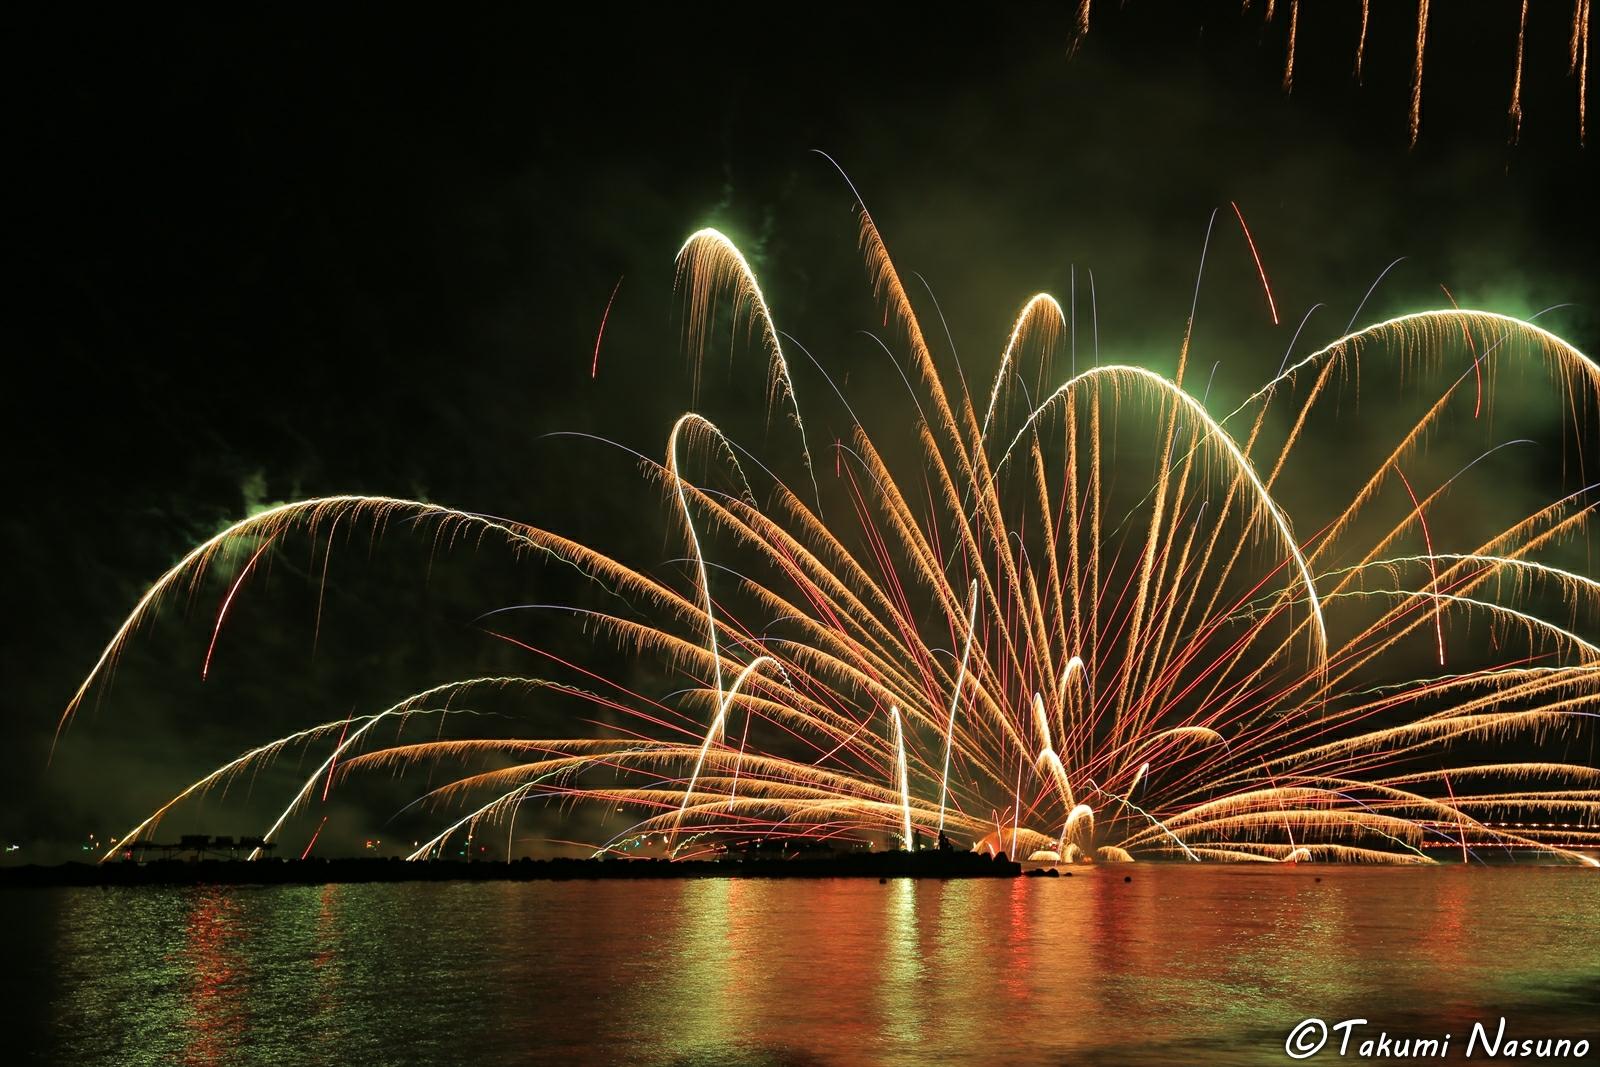 Marine self-explosion from Anjinsai Fireworks at Ito